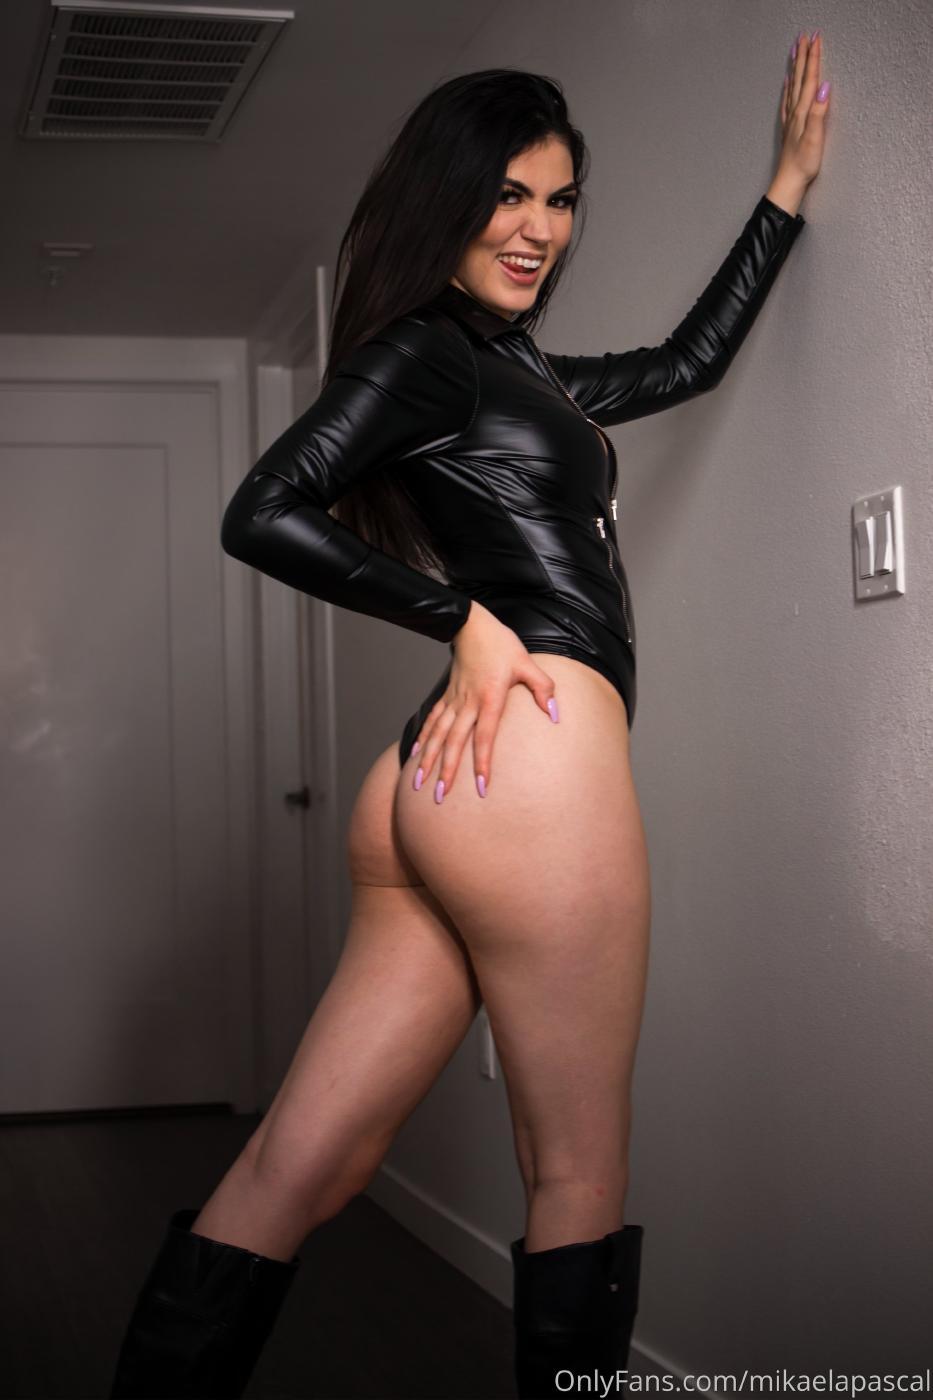 Mikaela Pascal Sexy Leather Bodysuit Onlyfans Set Leaked 0010